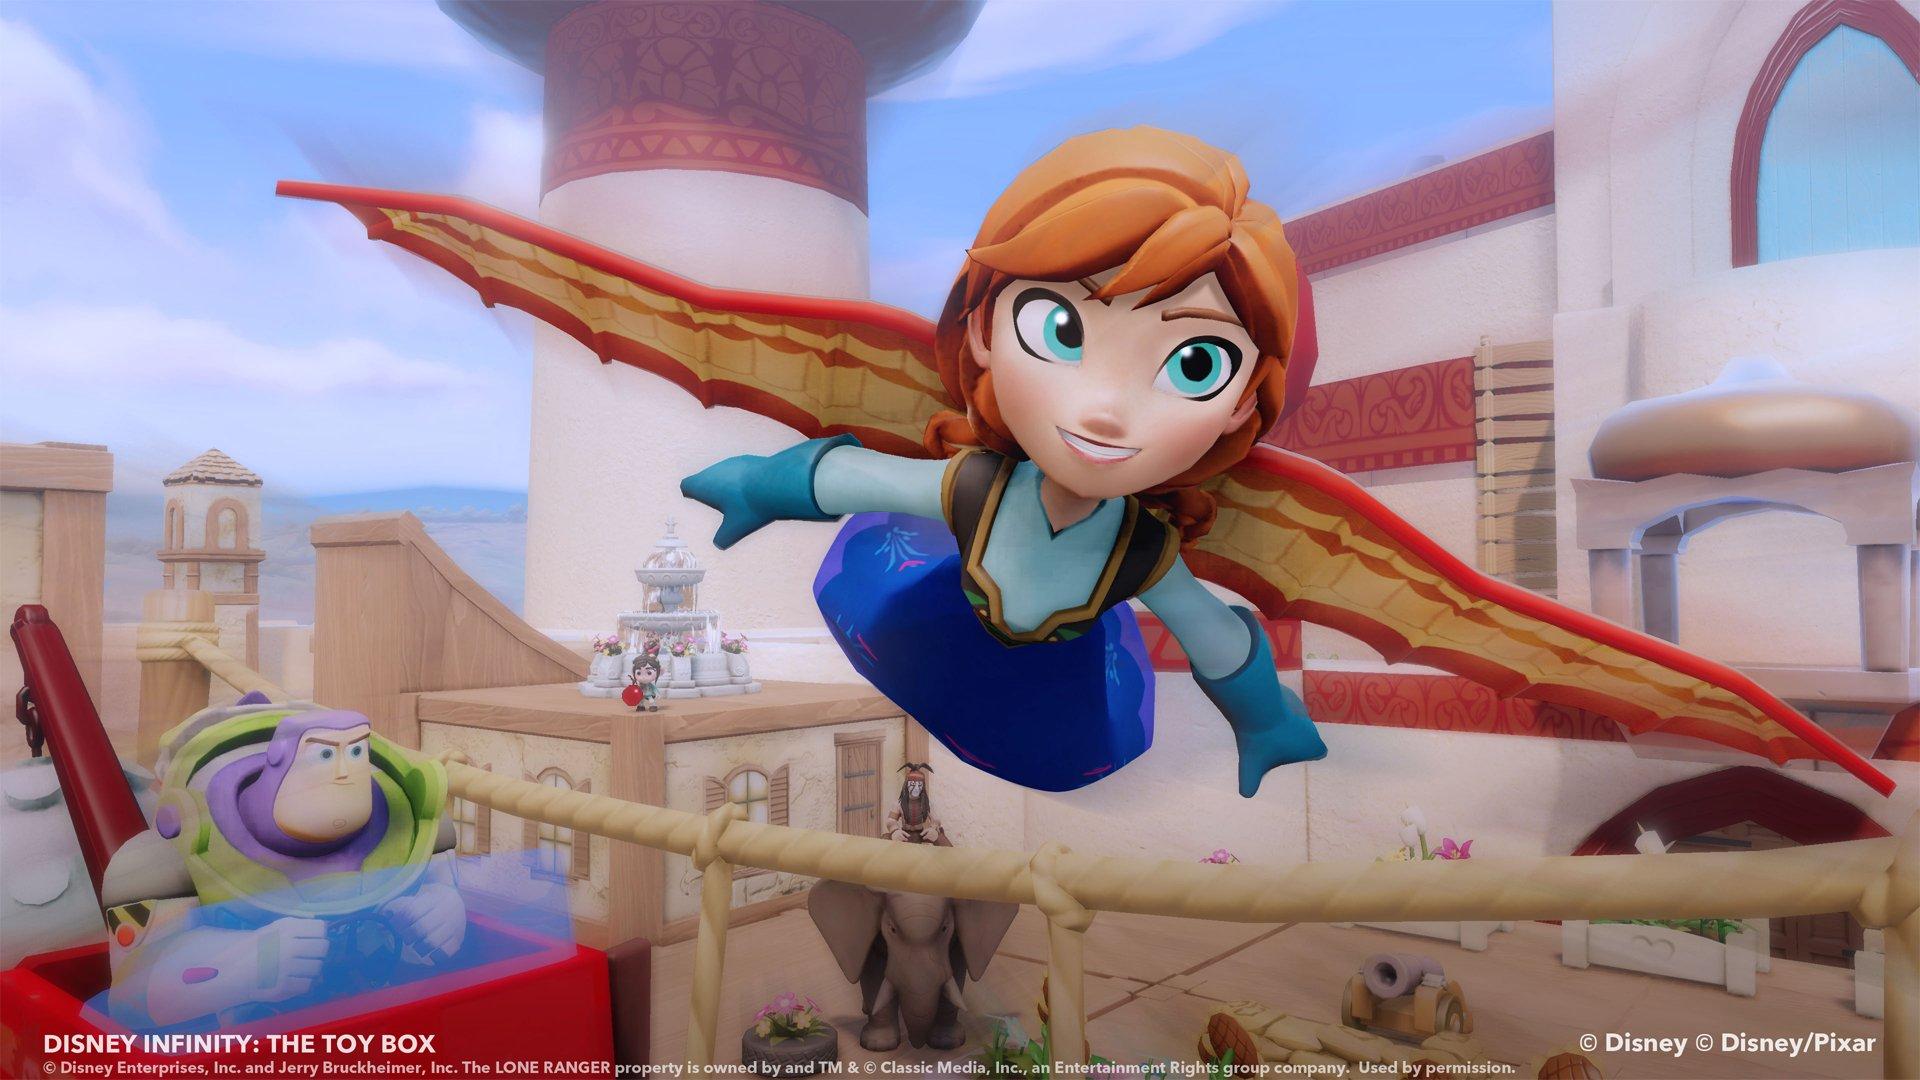 Wreck it ralph disney infinity wiki fandom powered by - Disney Infinity Holiday Characters 6 Jpg